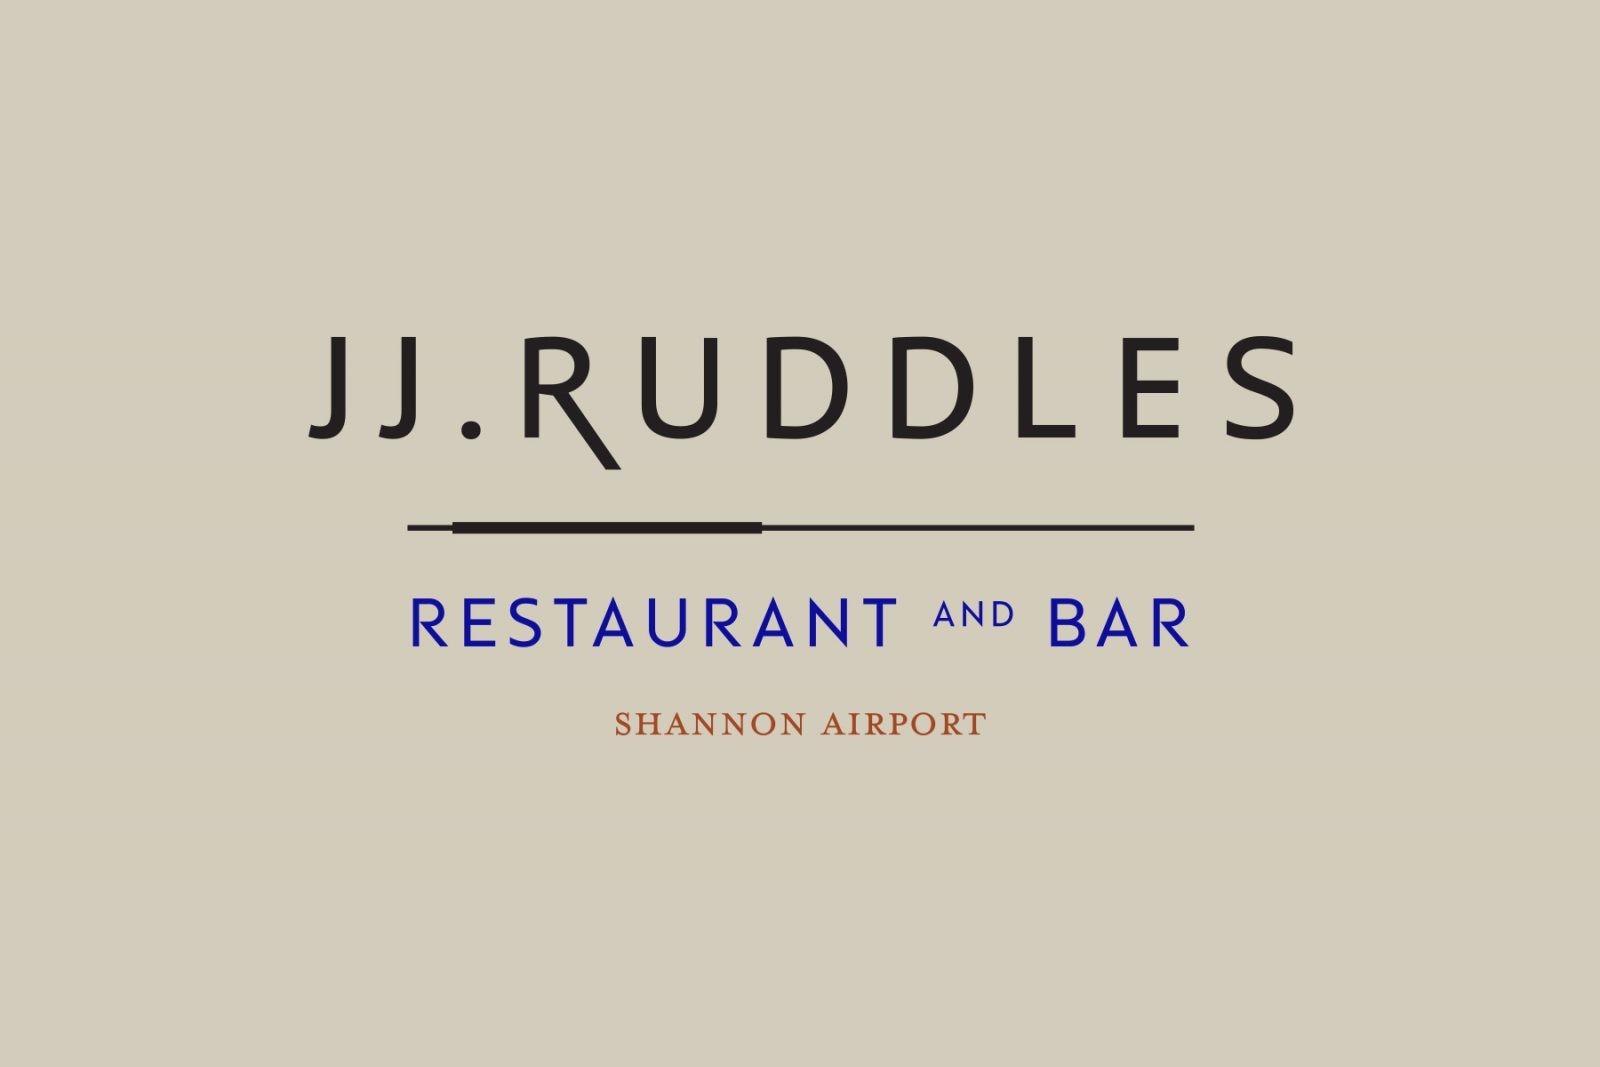 jj ruddles